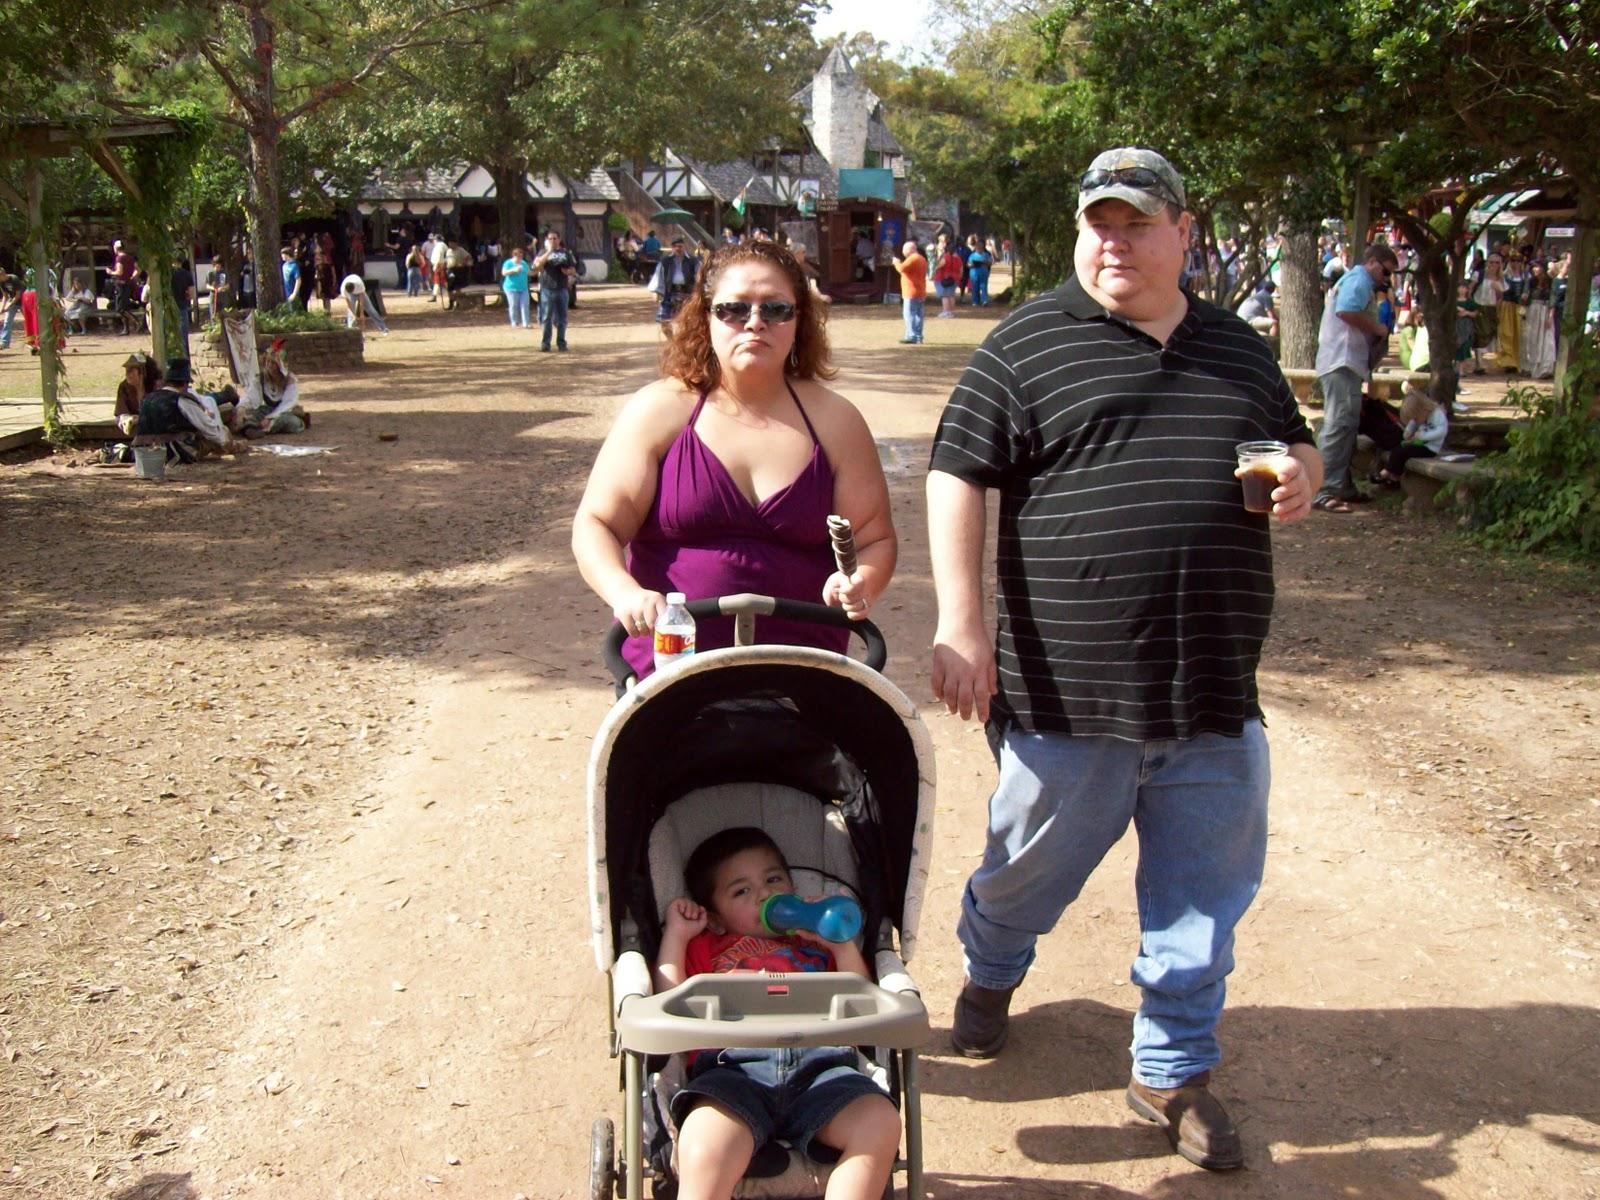 Texas Renaissance Festival - 101_5764.JPG